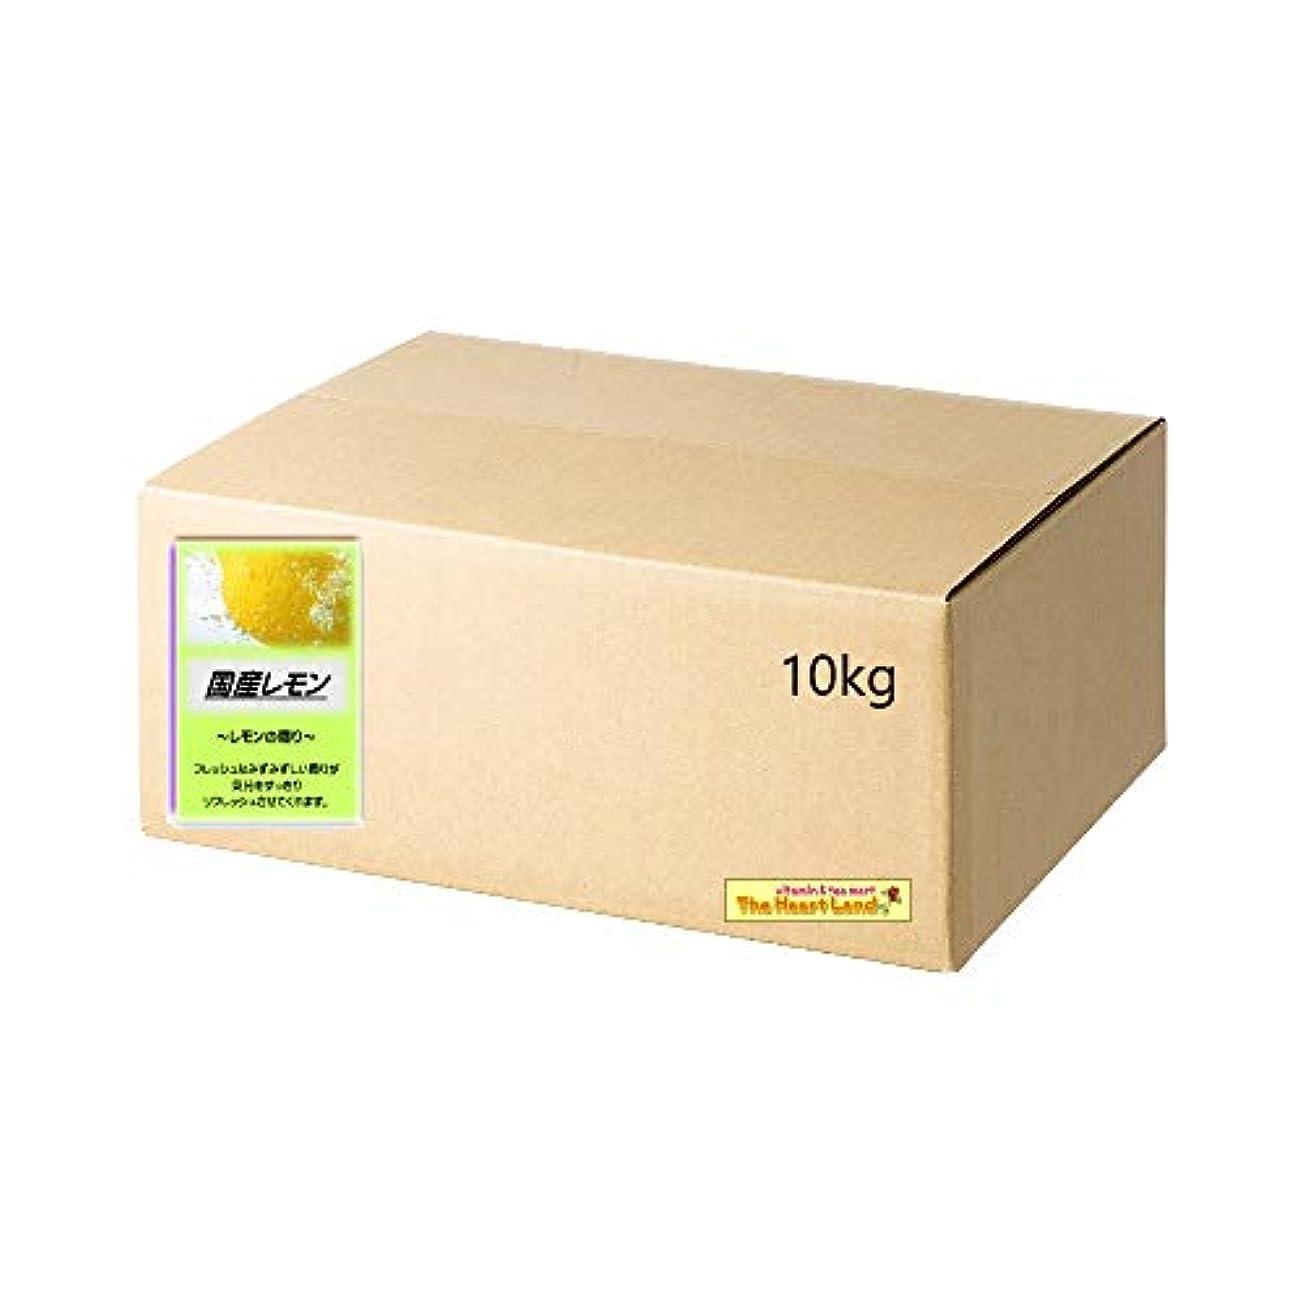 緑雷雨違反アサヒ入浴剤 浴用入浴化粧品 国産レモン 10kg